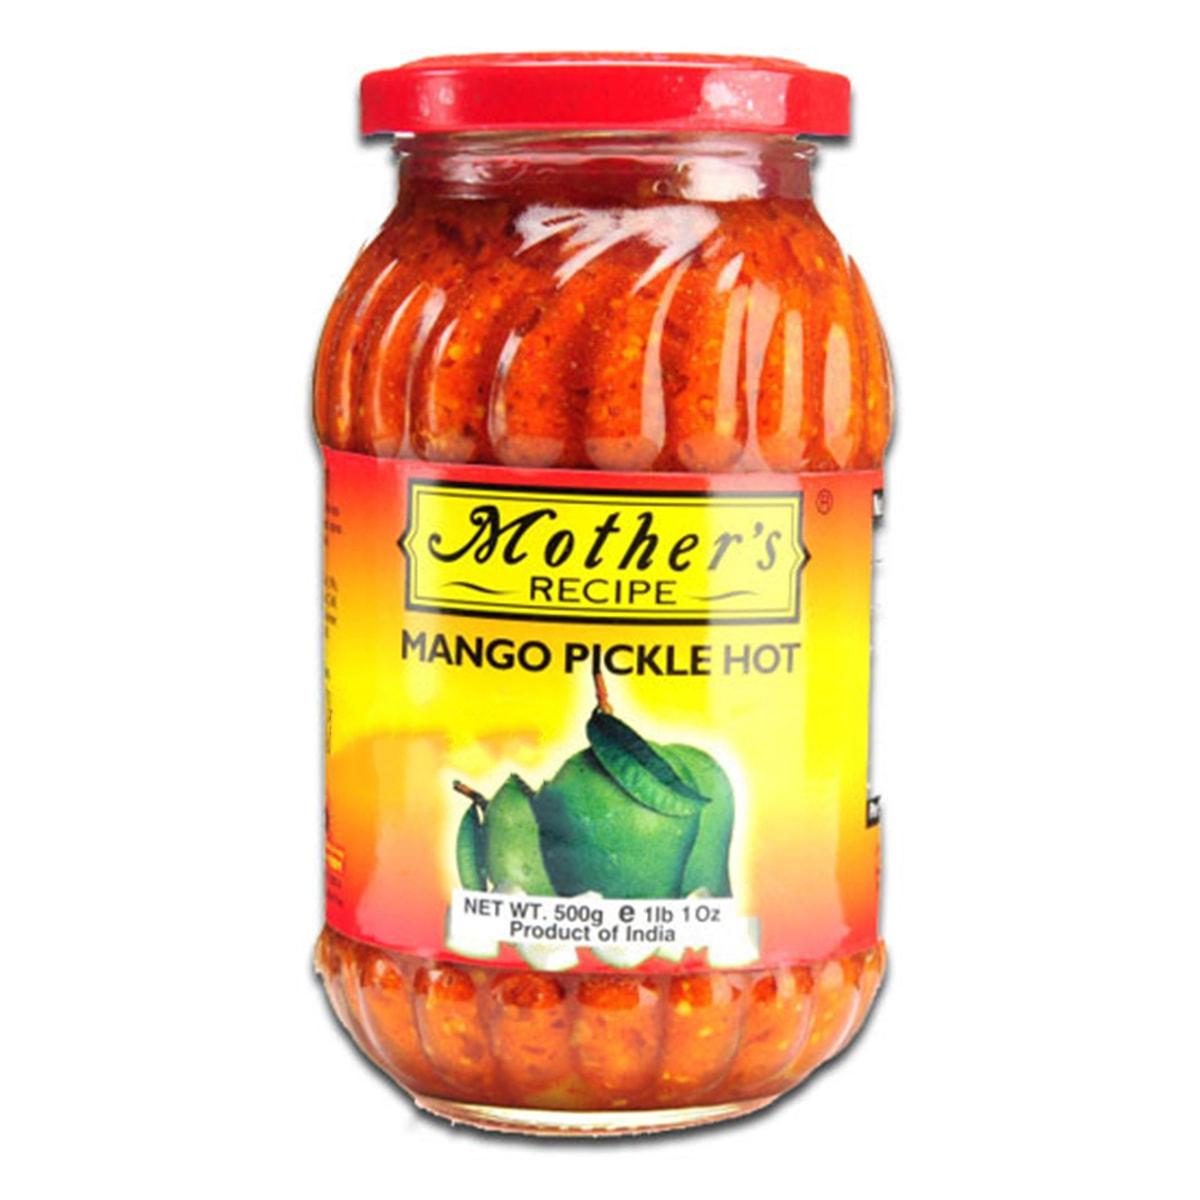 Mango Pickle Hot - 500 gm